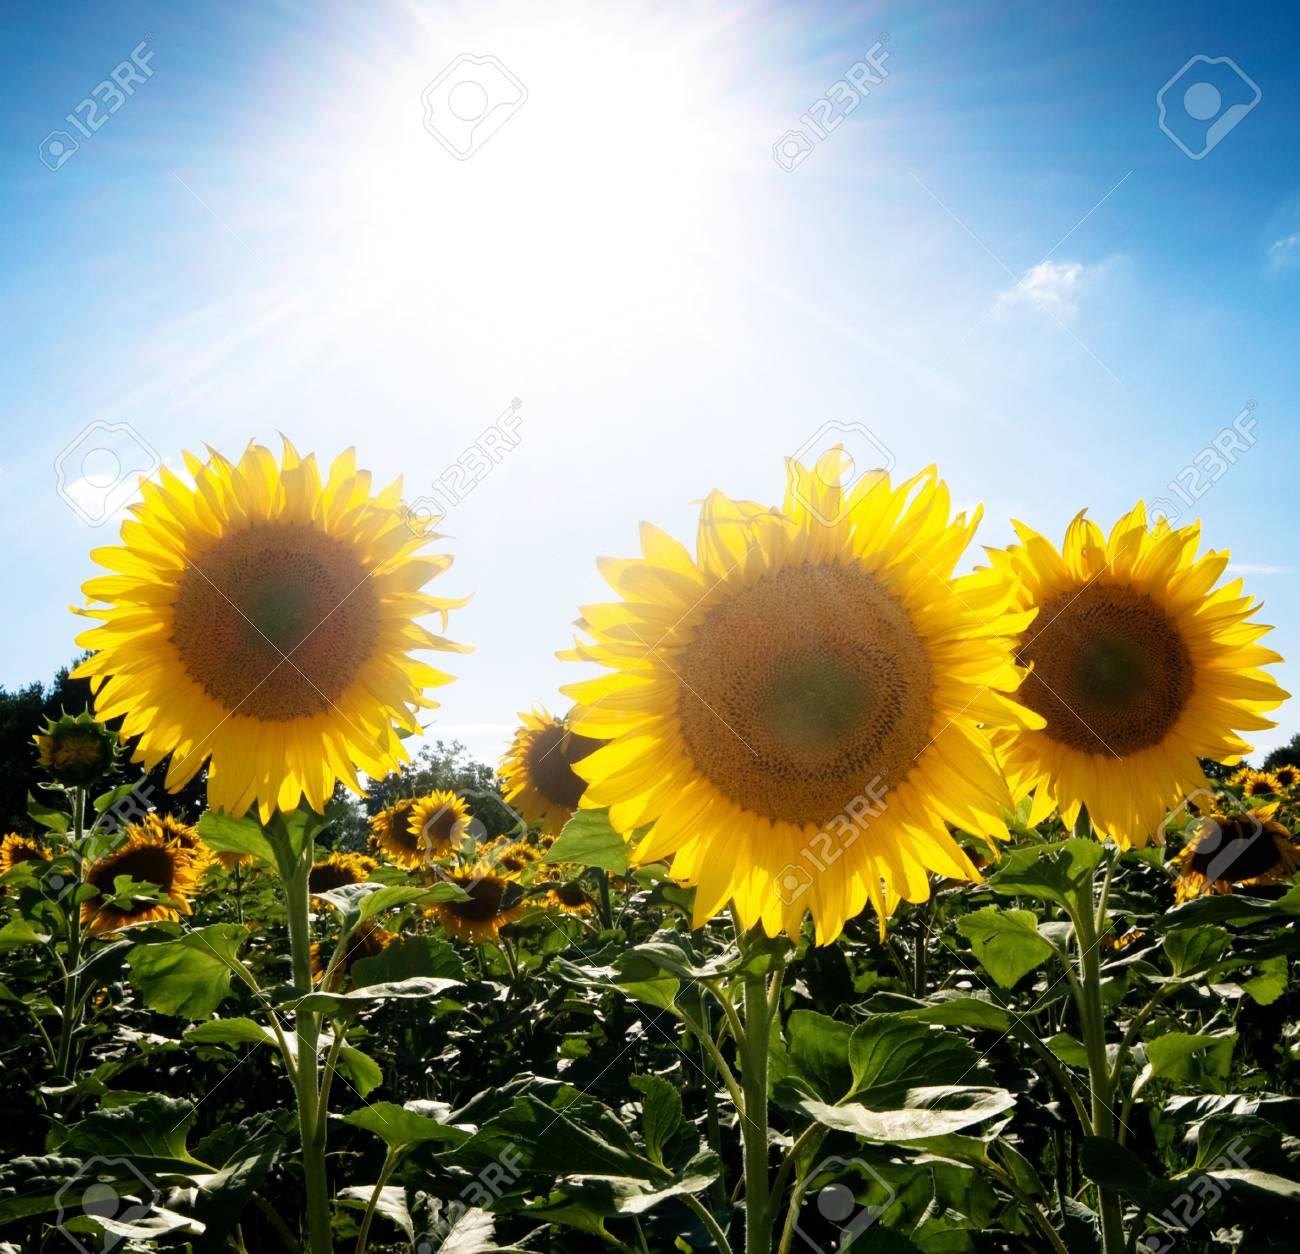 beautiful sunflower field under blue with bright sun Stock Photo - 5249463